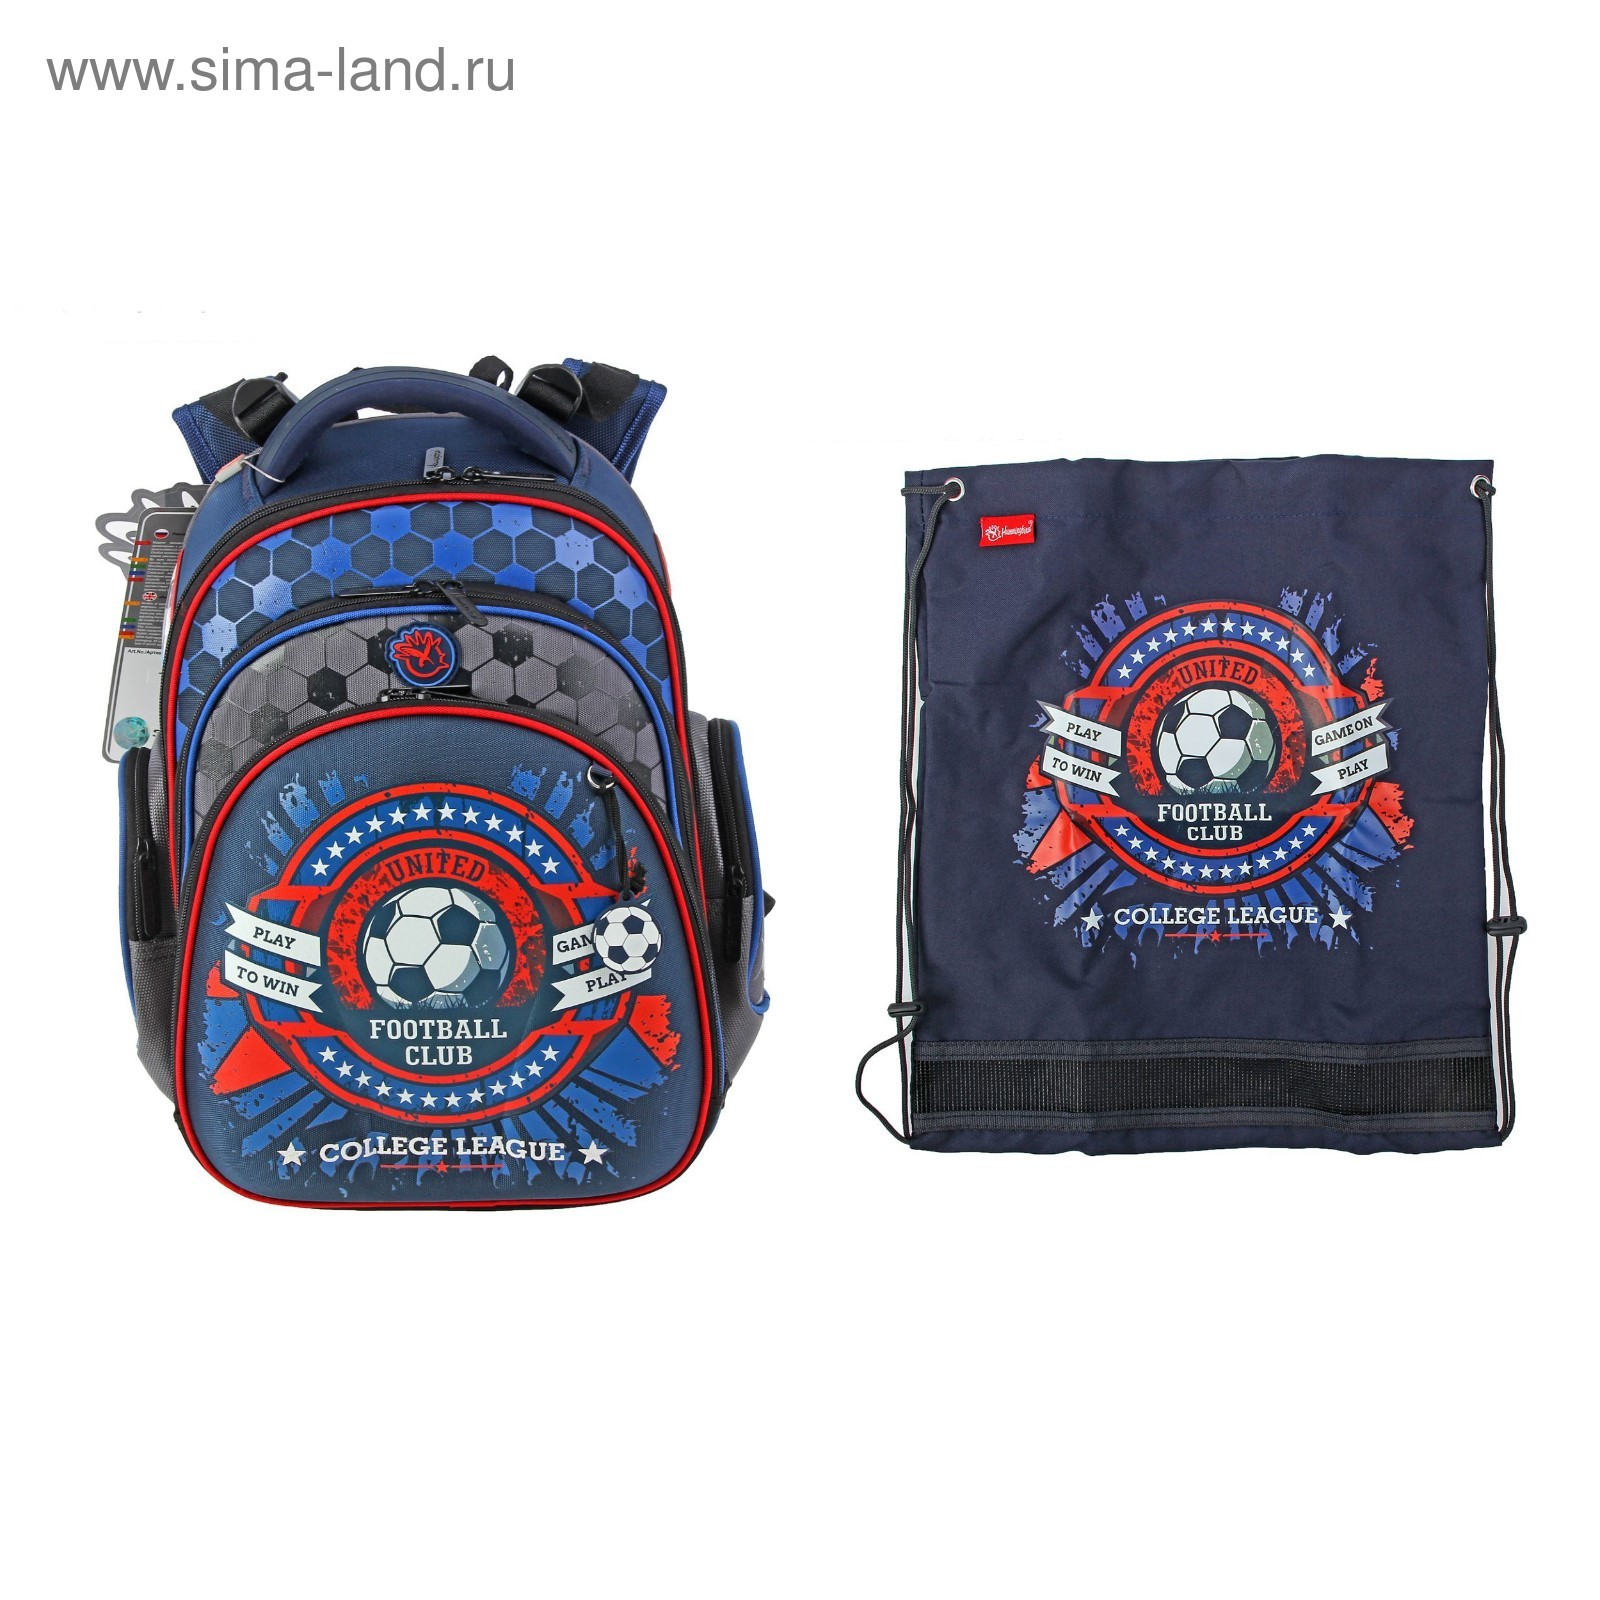 d32d8628d0b1 Рюкзак каркасный Hummingbird 32*27*18 + мешок для обуви, для мальчика,